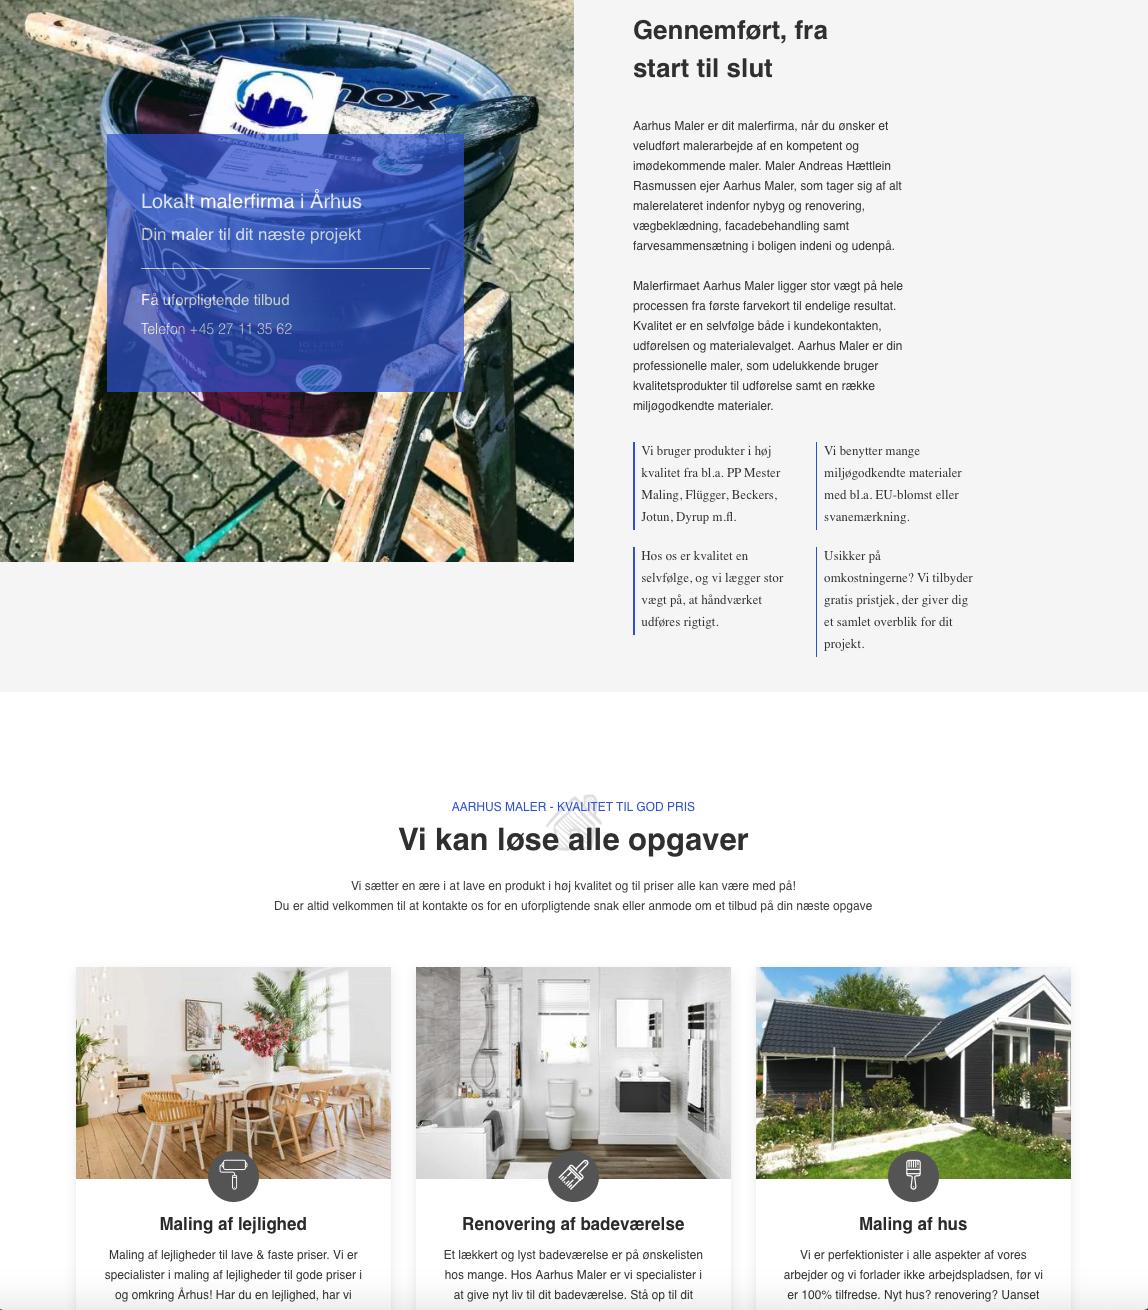 Aarhus Maler